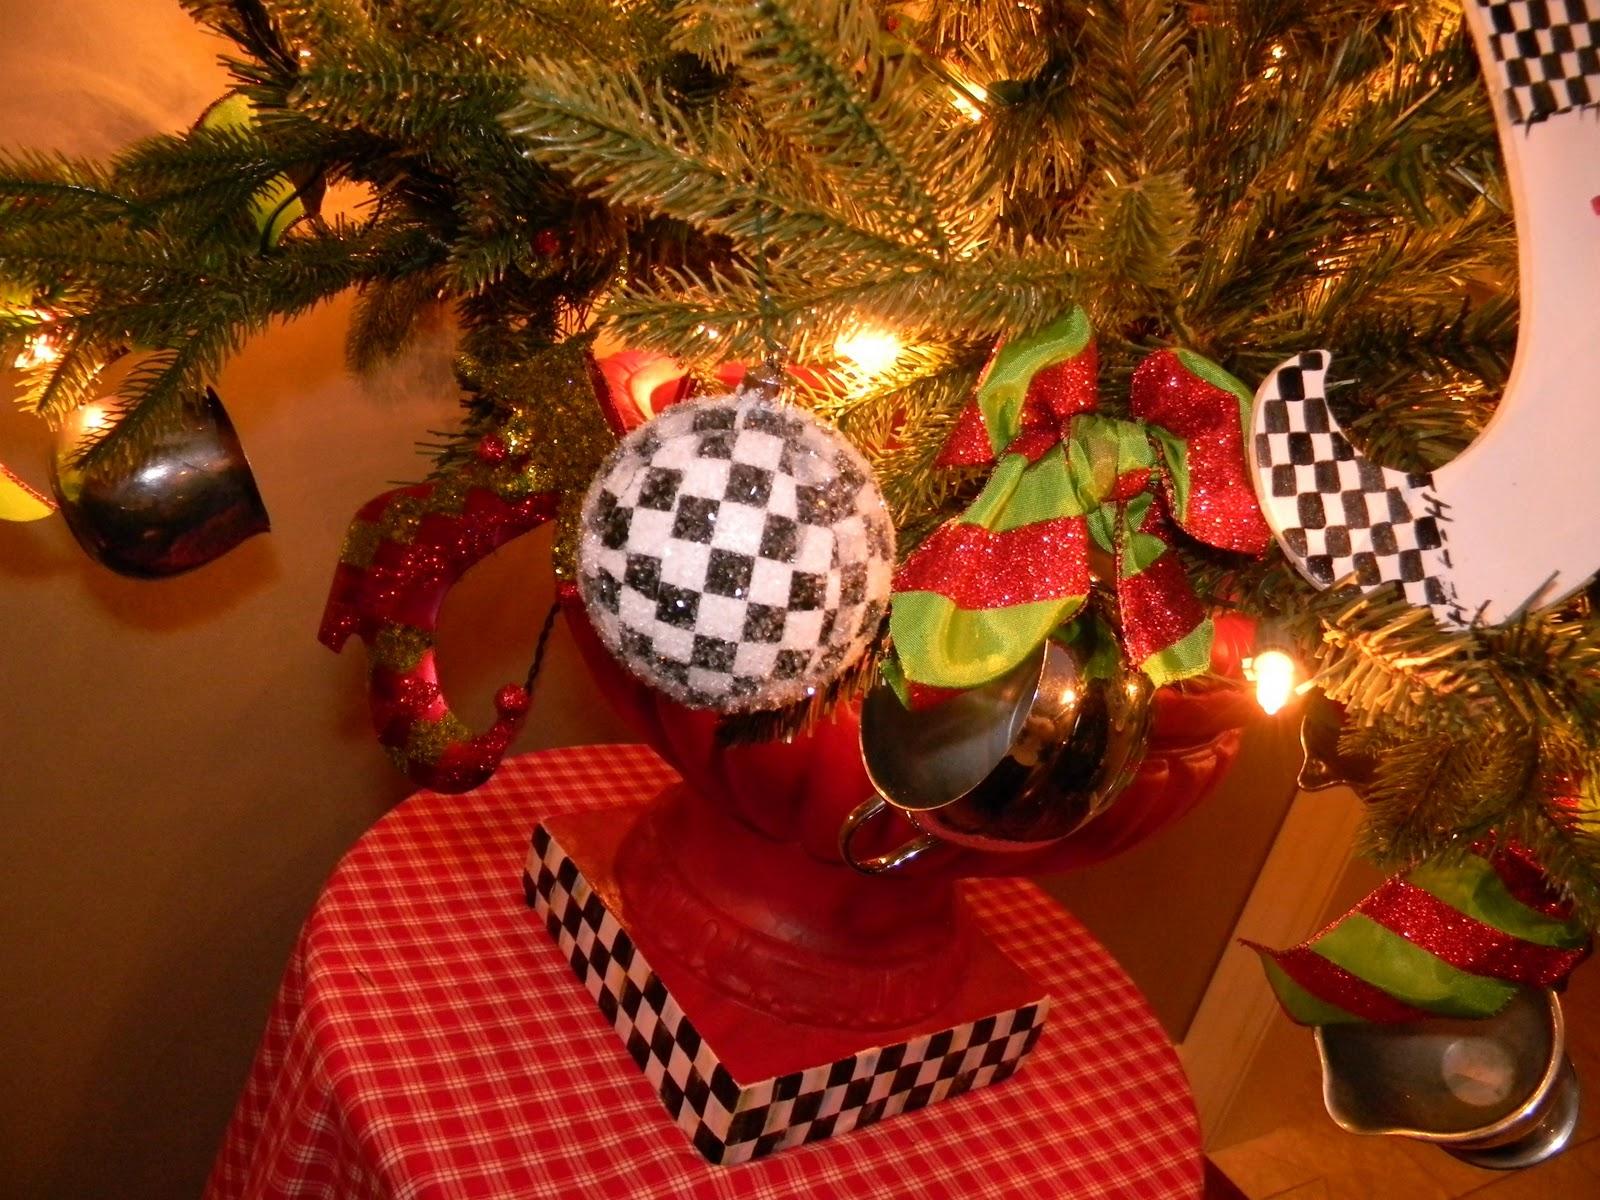 Mackenzie Childs Christmas Ornaments.Mackenzie Childs Inspiration Ornament Tutorial Jojos